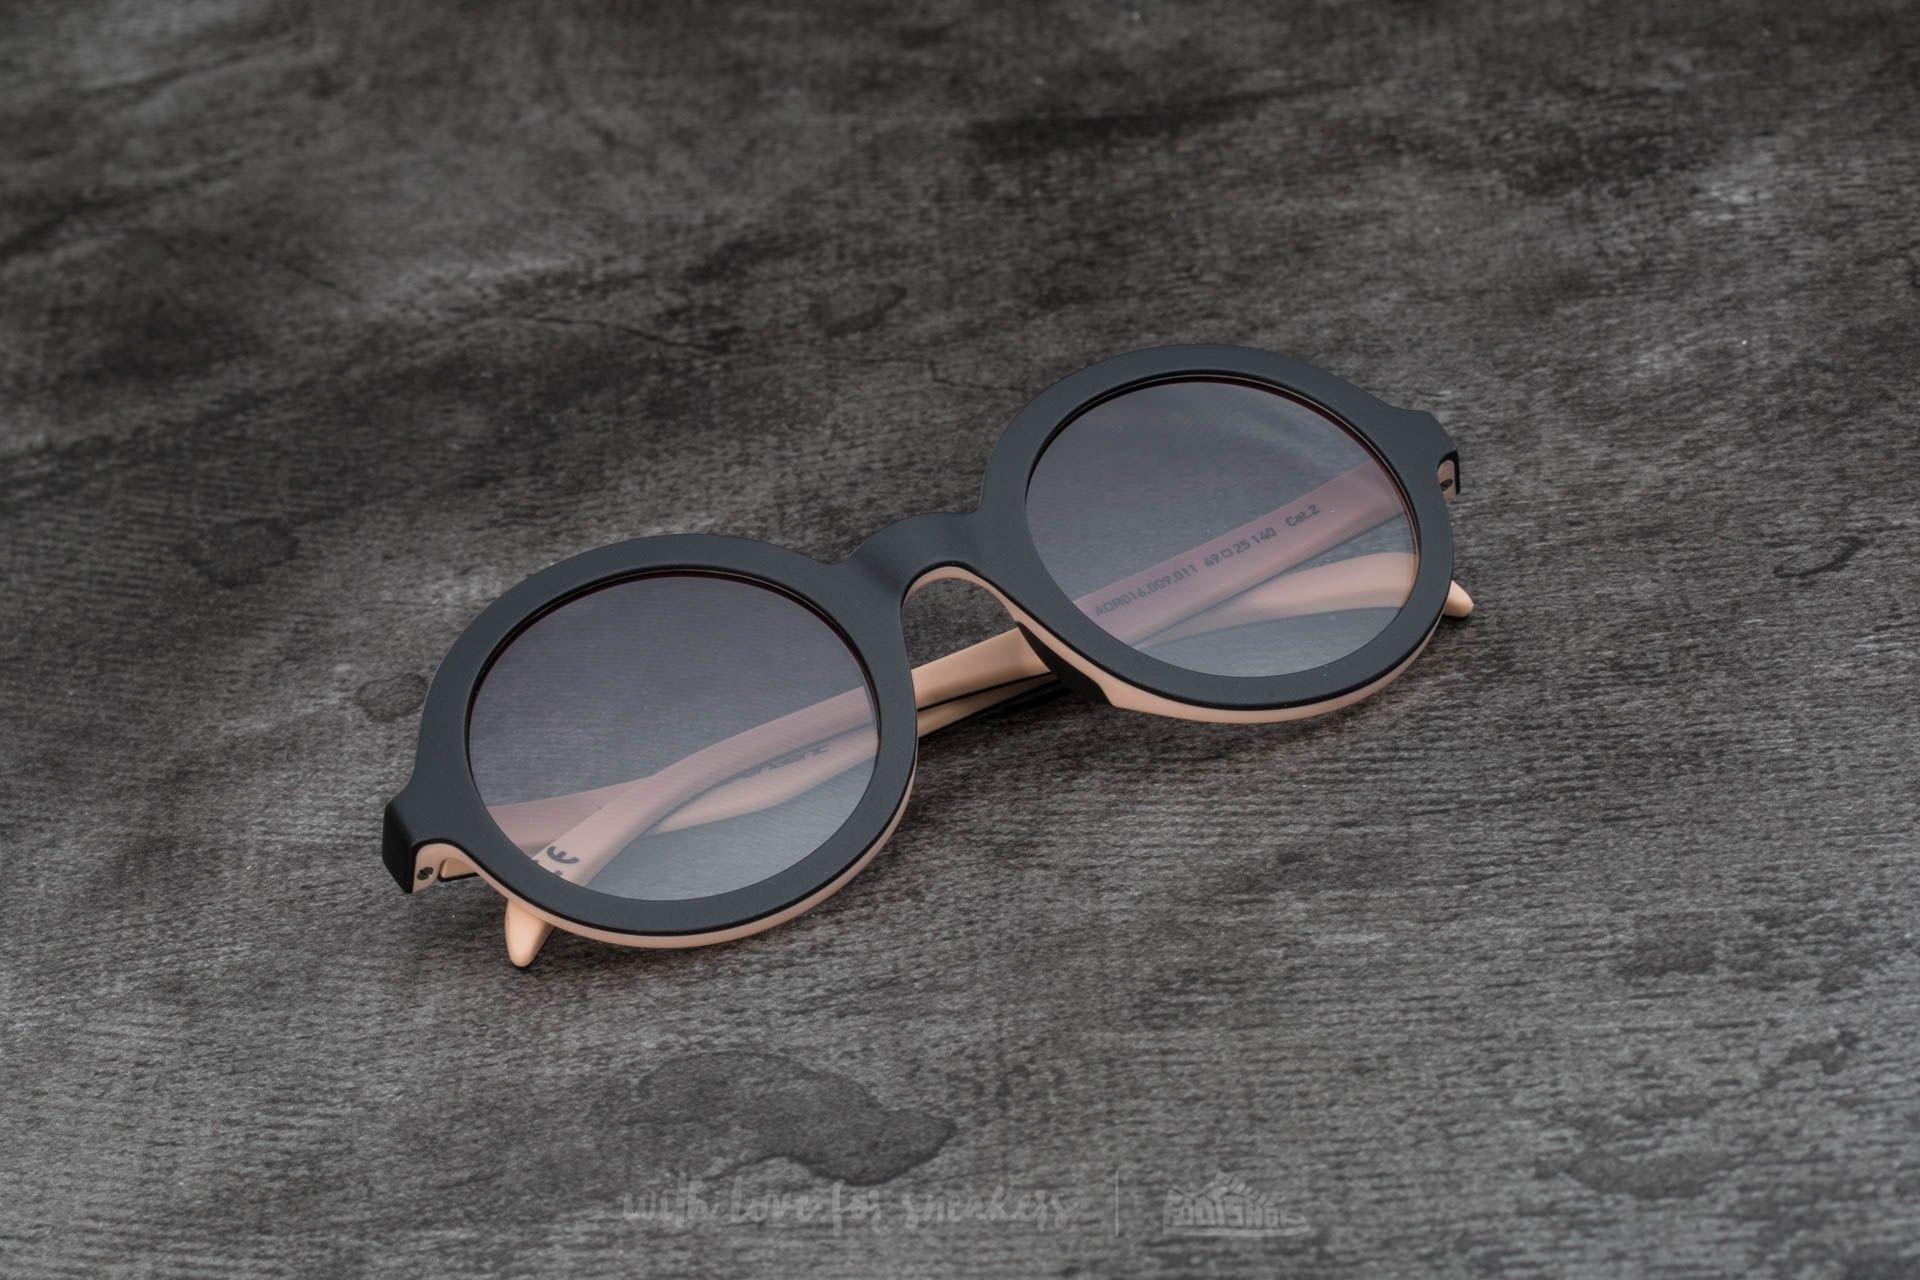 adidas x Italia Independent AOR016 Sunglasses Black  Powder ... 22644367a5f